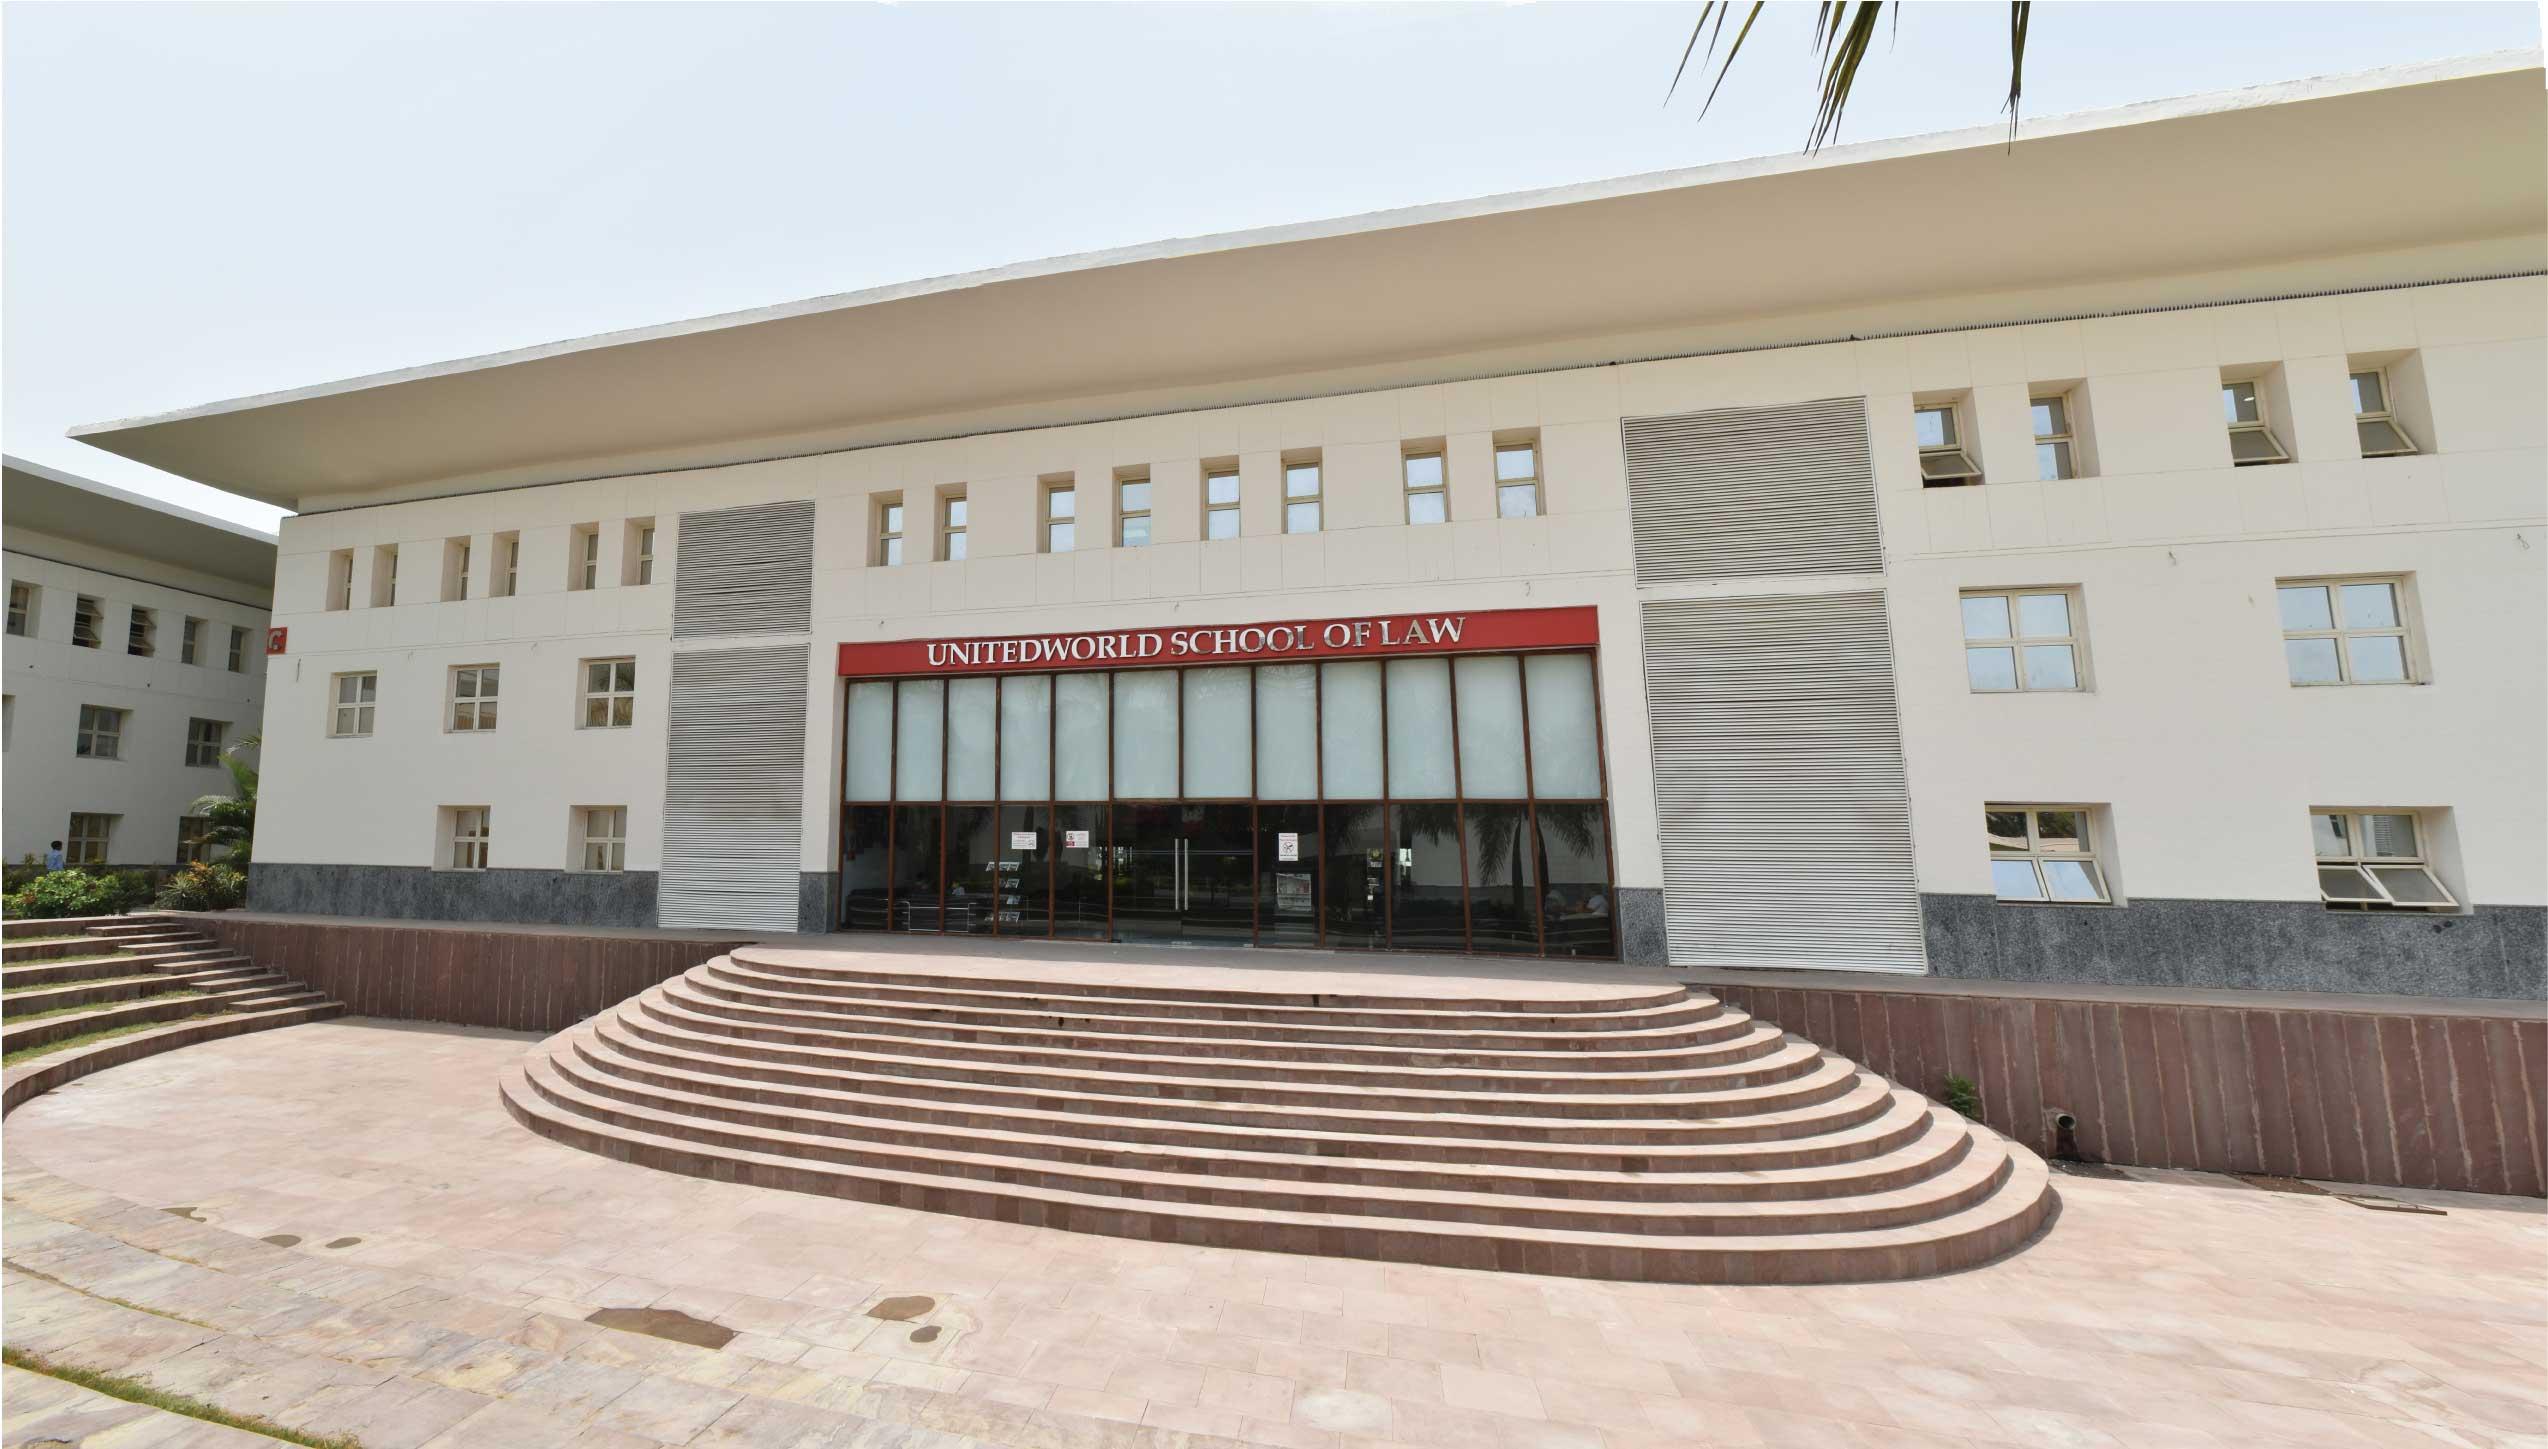 Unitedworld School of Law, Gandhinagar